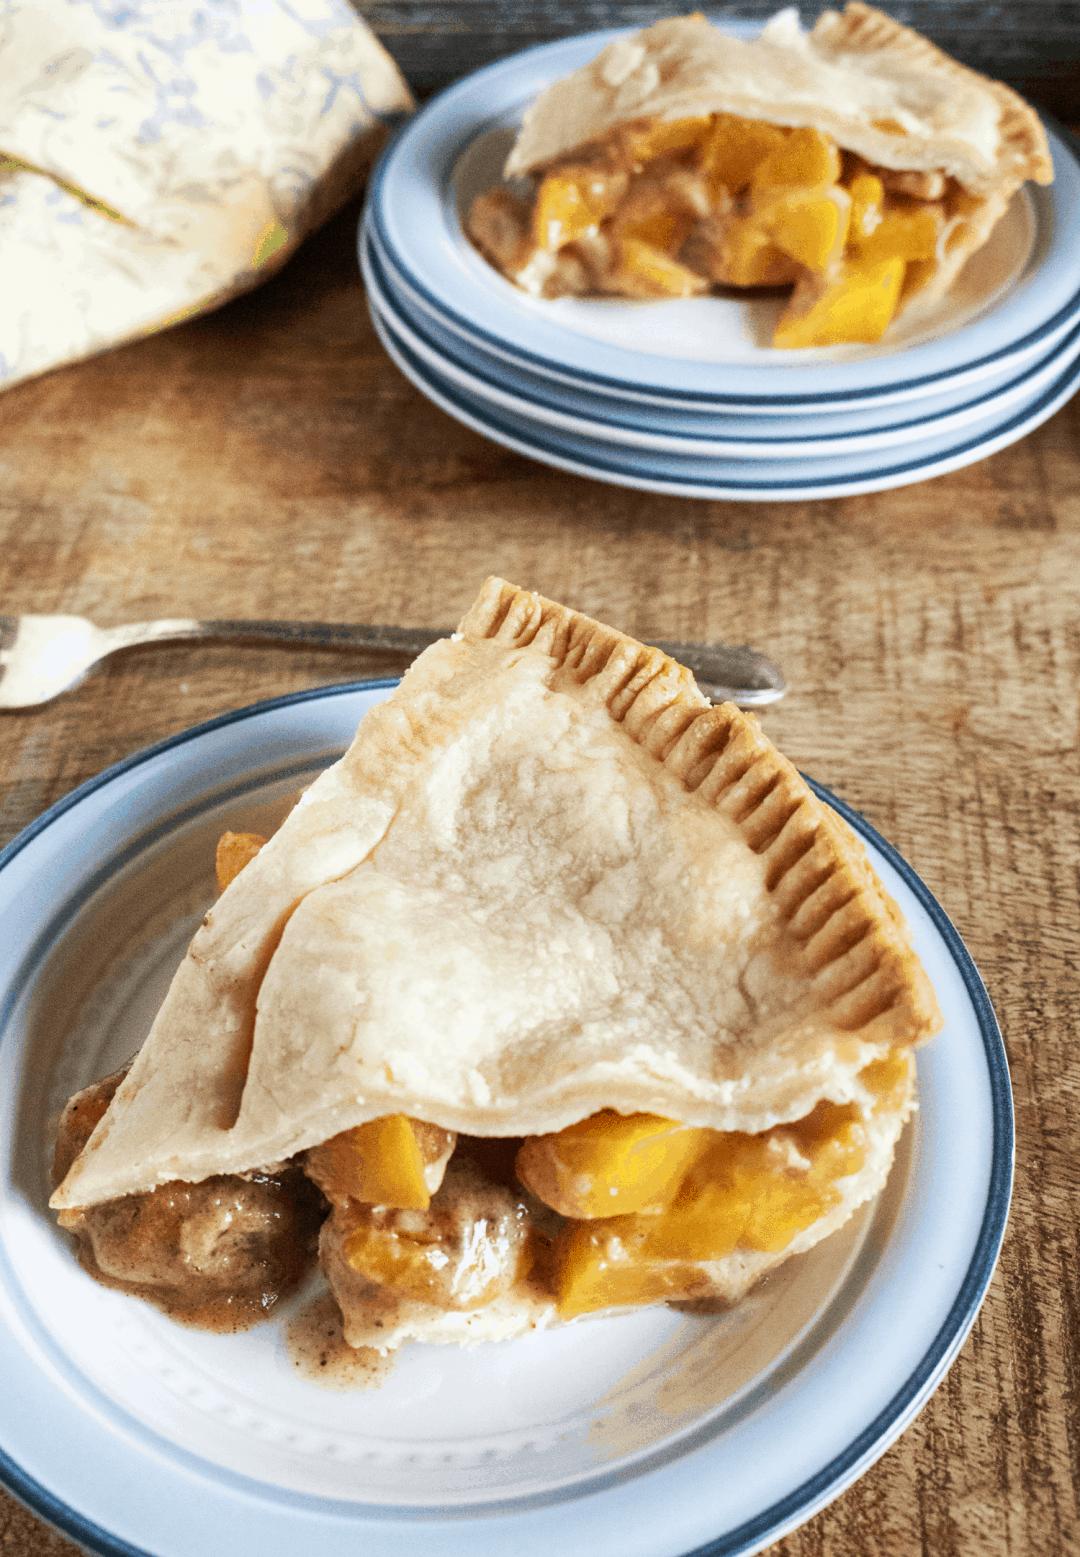 homemade peach pie on a plate